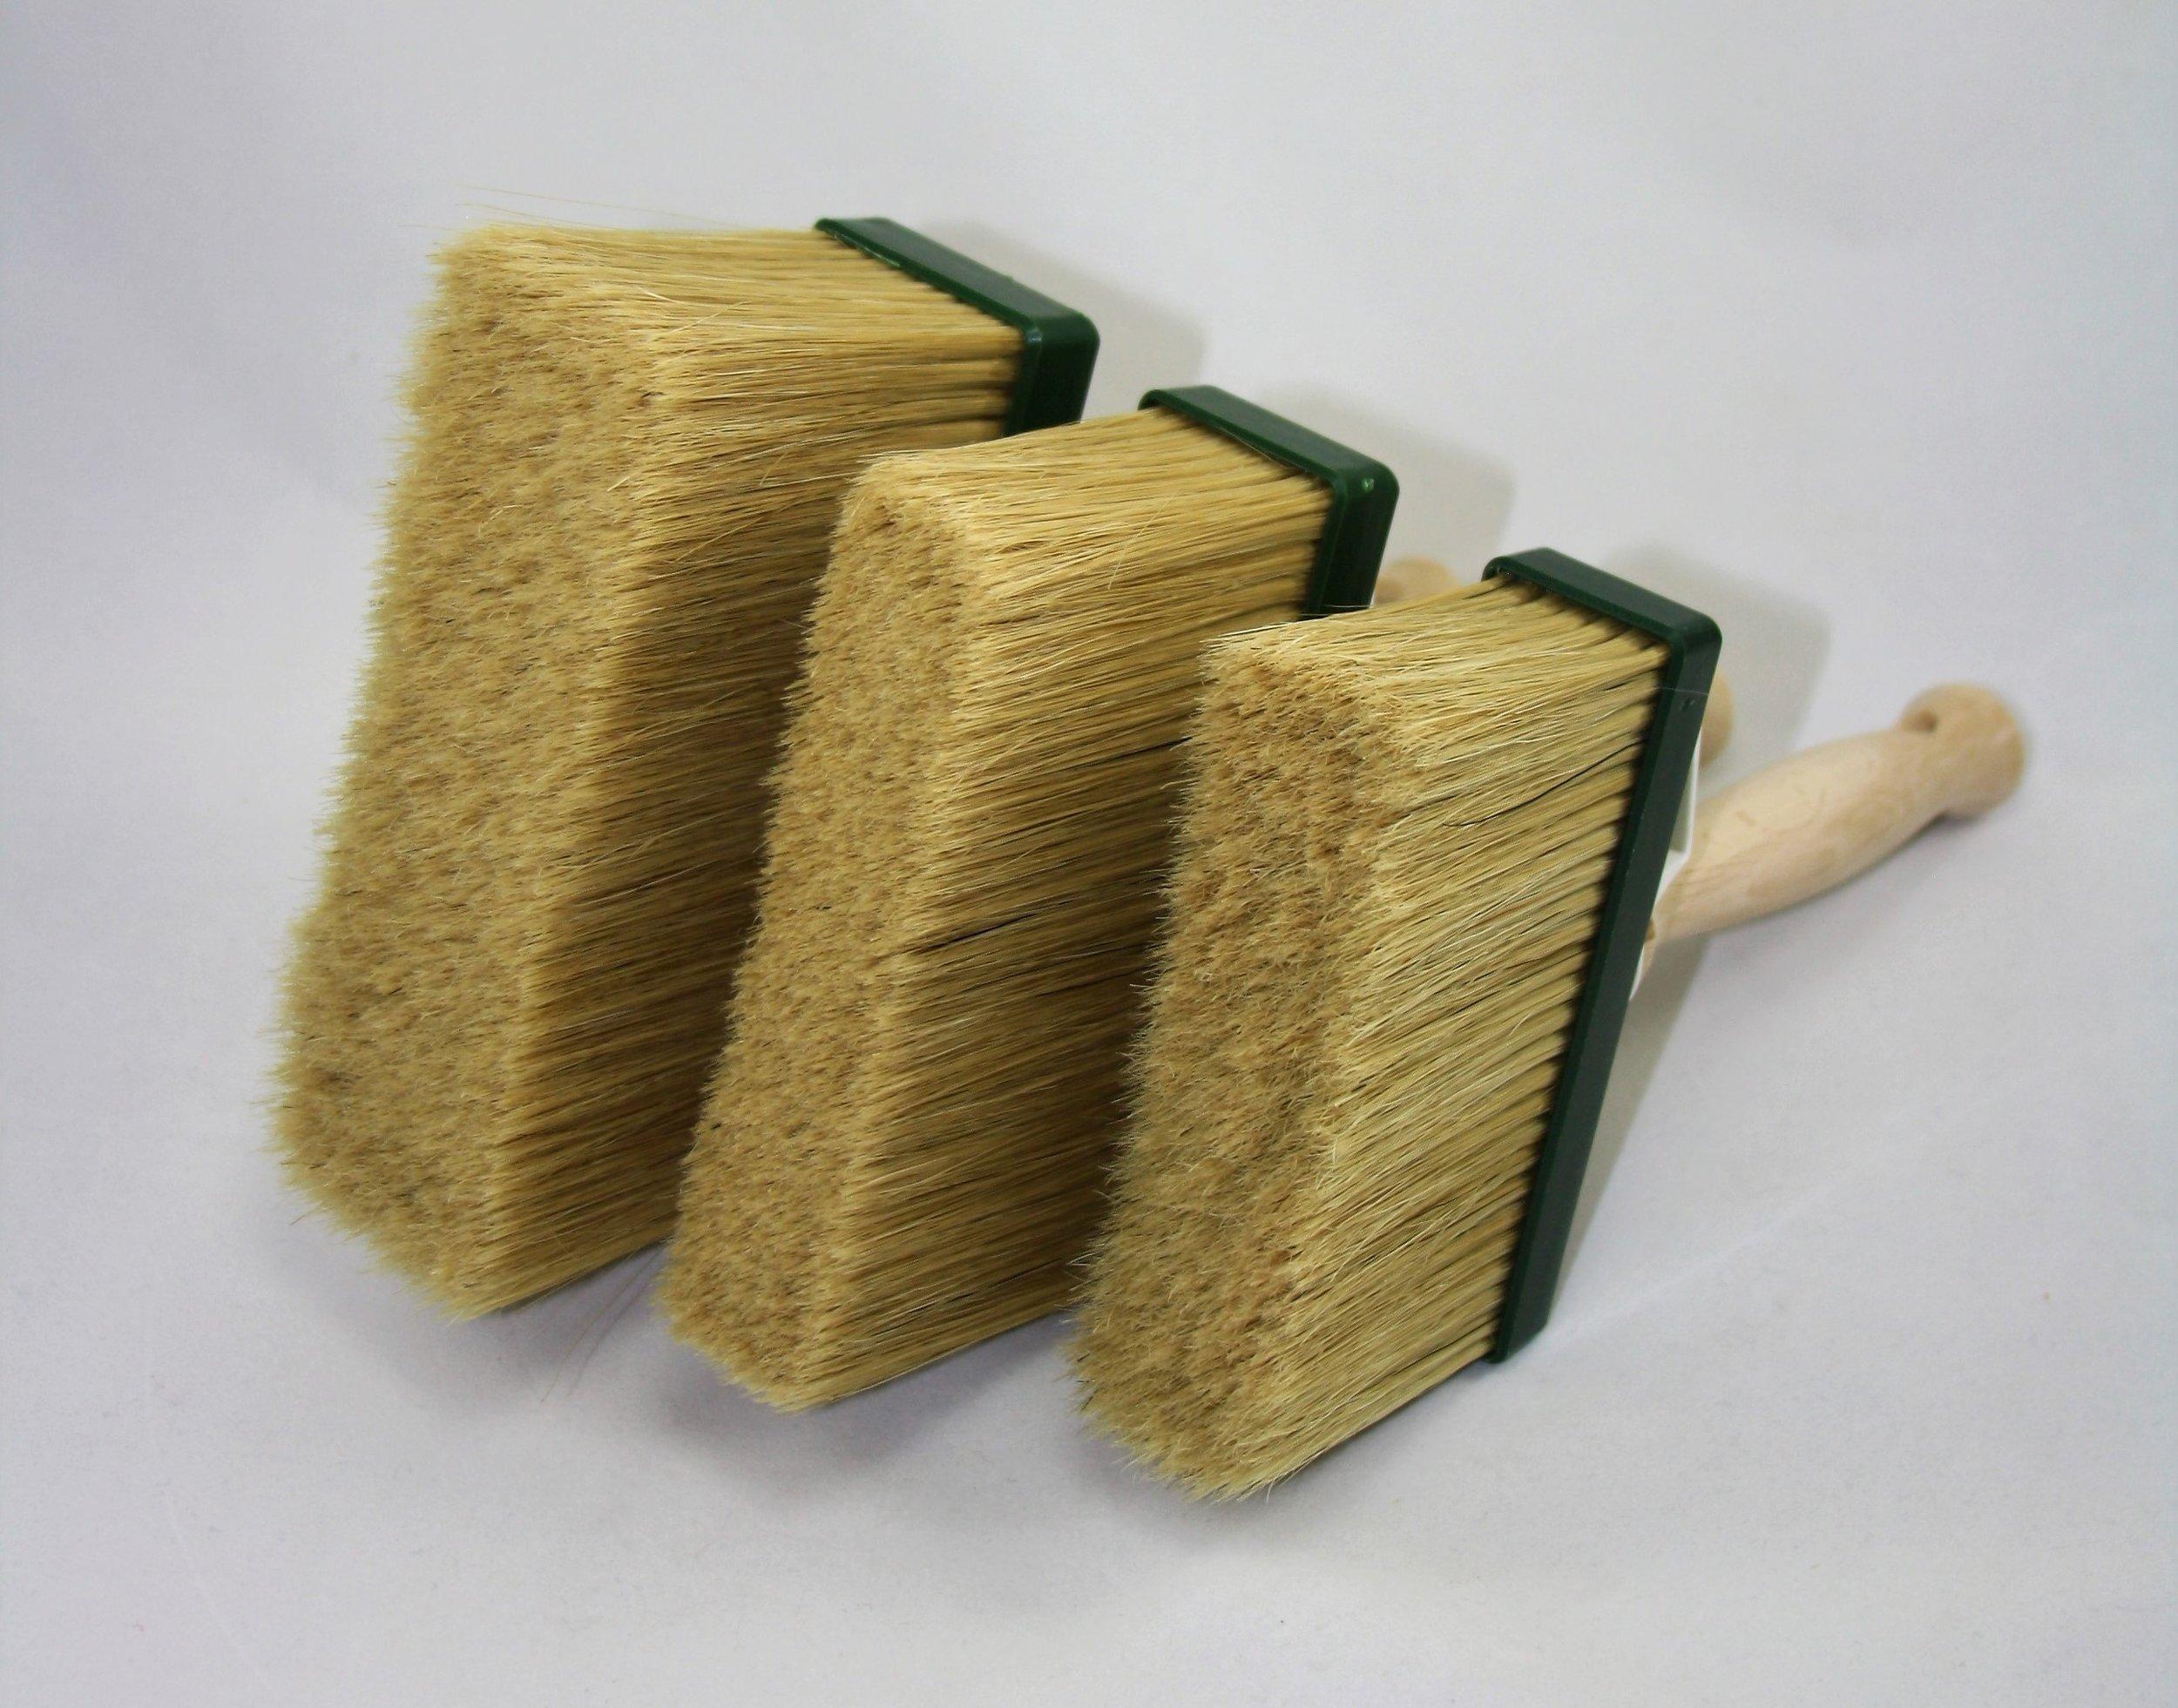 Tradesman Brushes - Large, Medium and Small